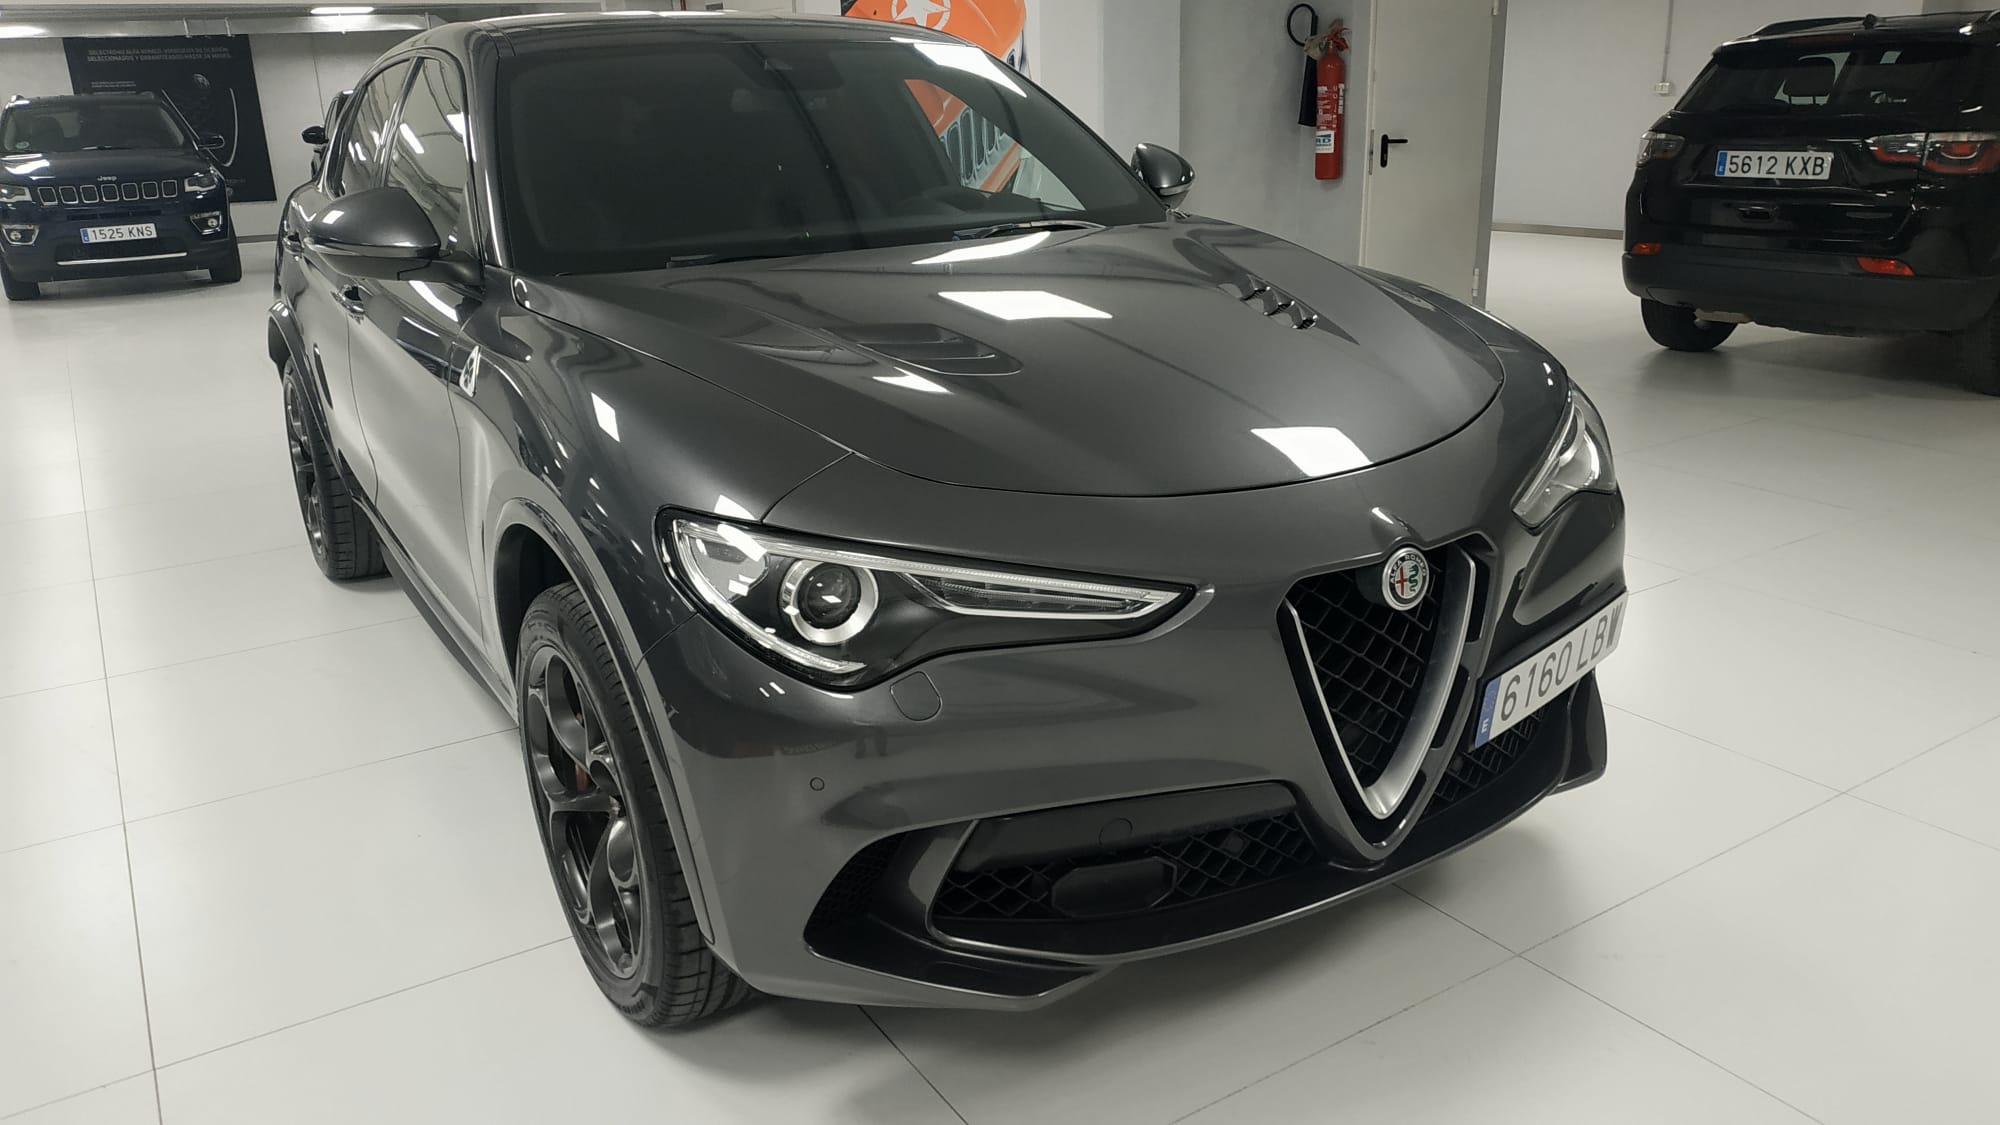 Alfa Romeo Stelvio ocasión segunda mano 2019 Gasolina por 73.900€ en Málaga